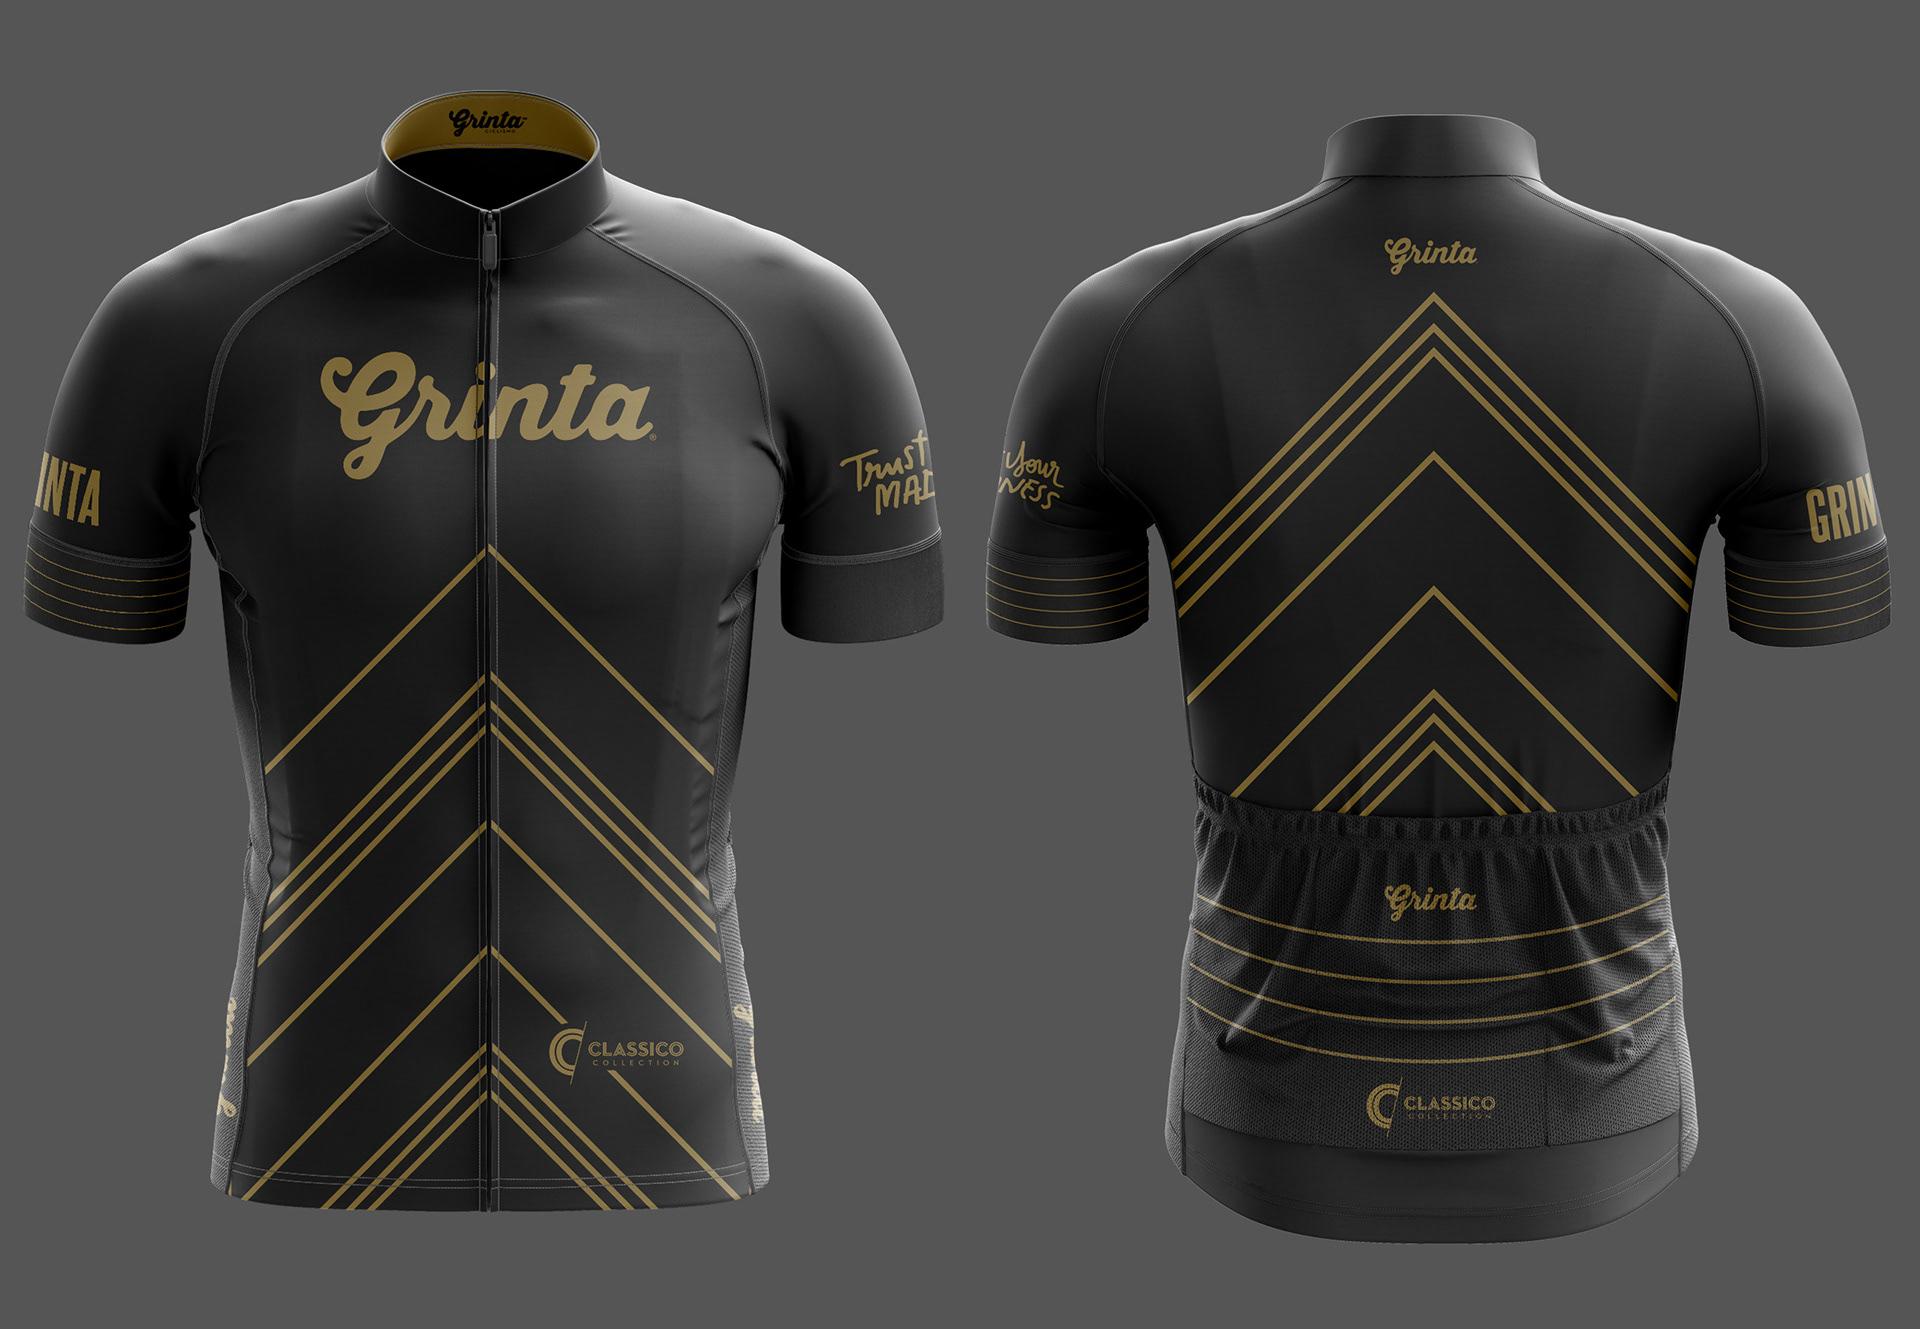 grinta-jerseys-classico.jpg